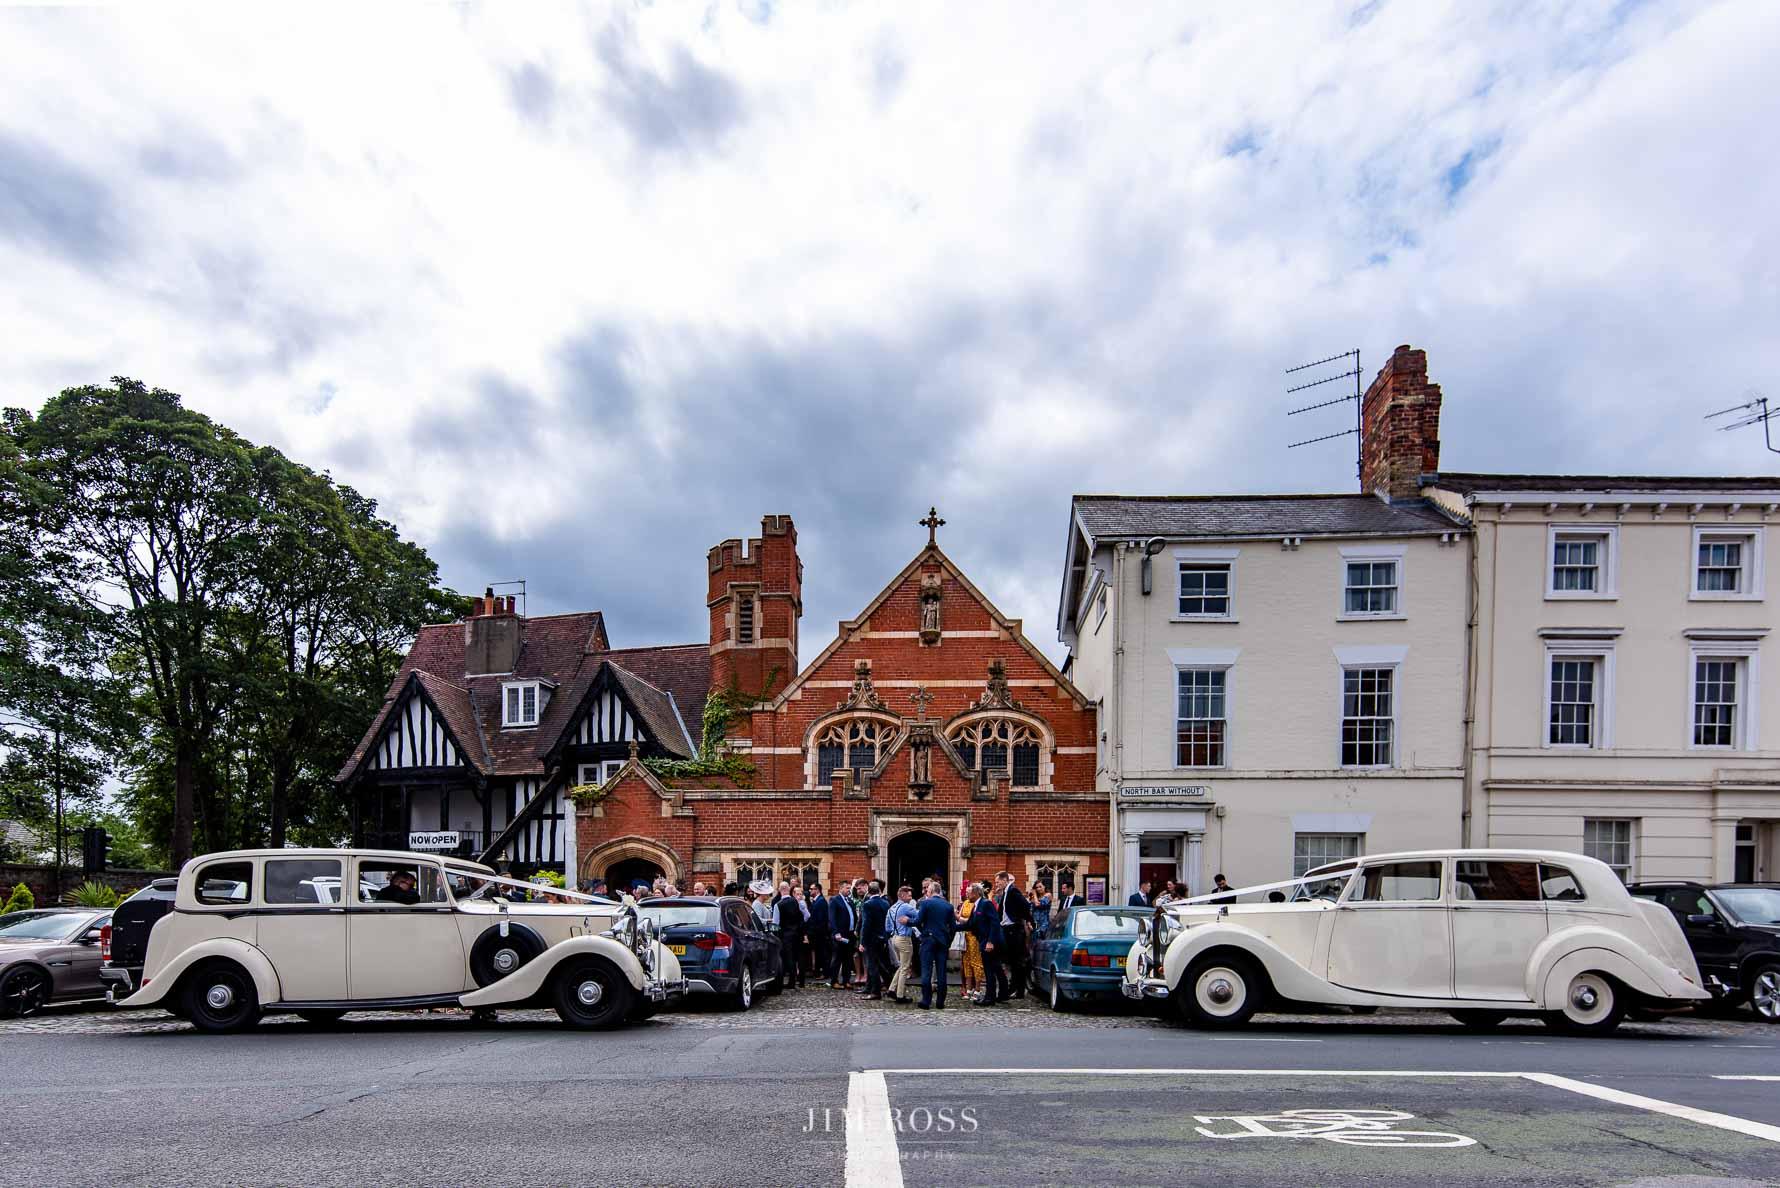 Rolls Royce cars outside St Johns Church Beverley